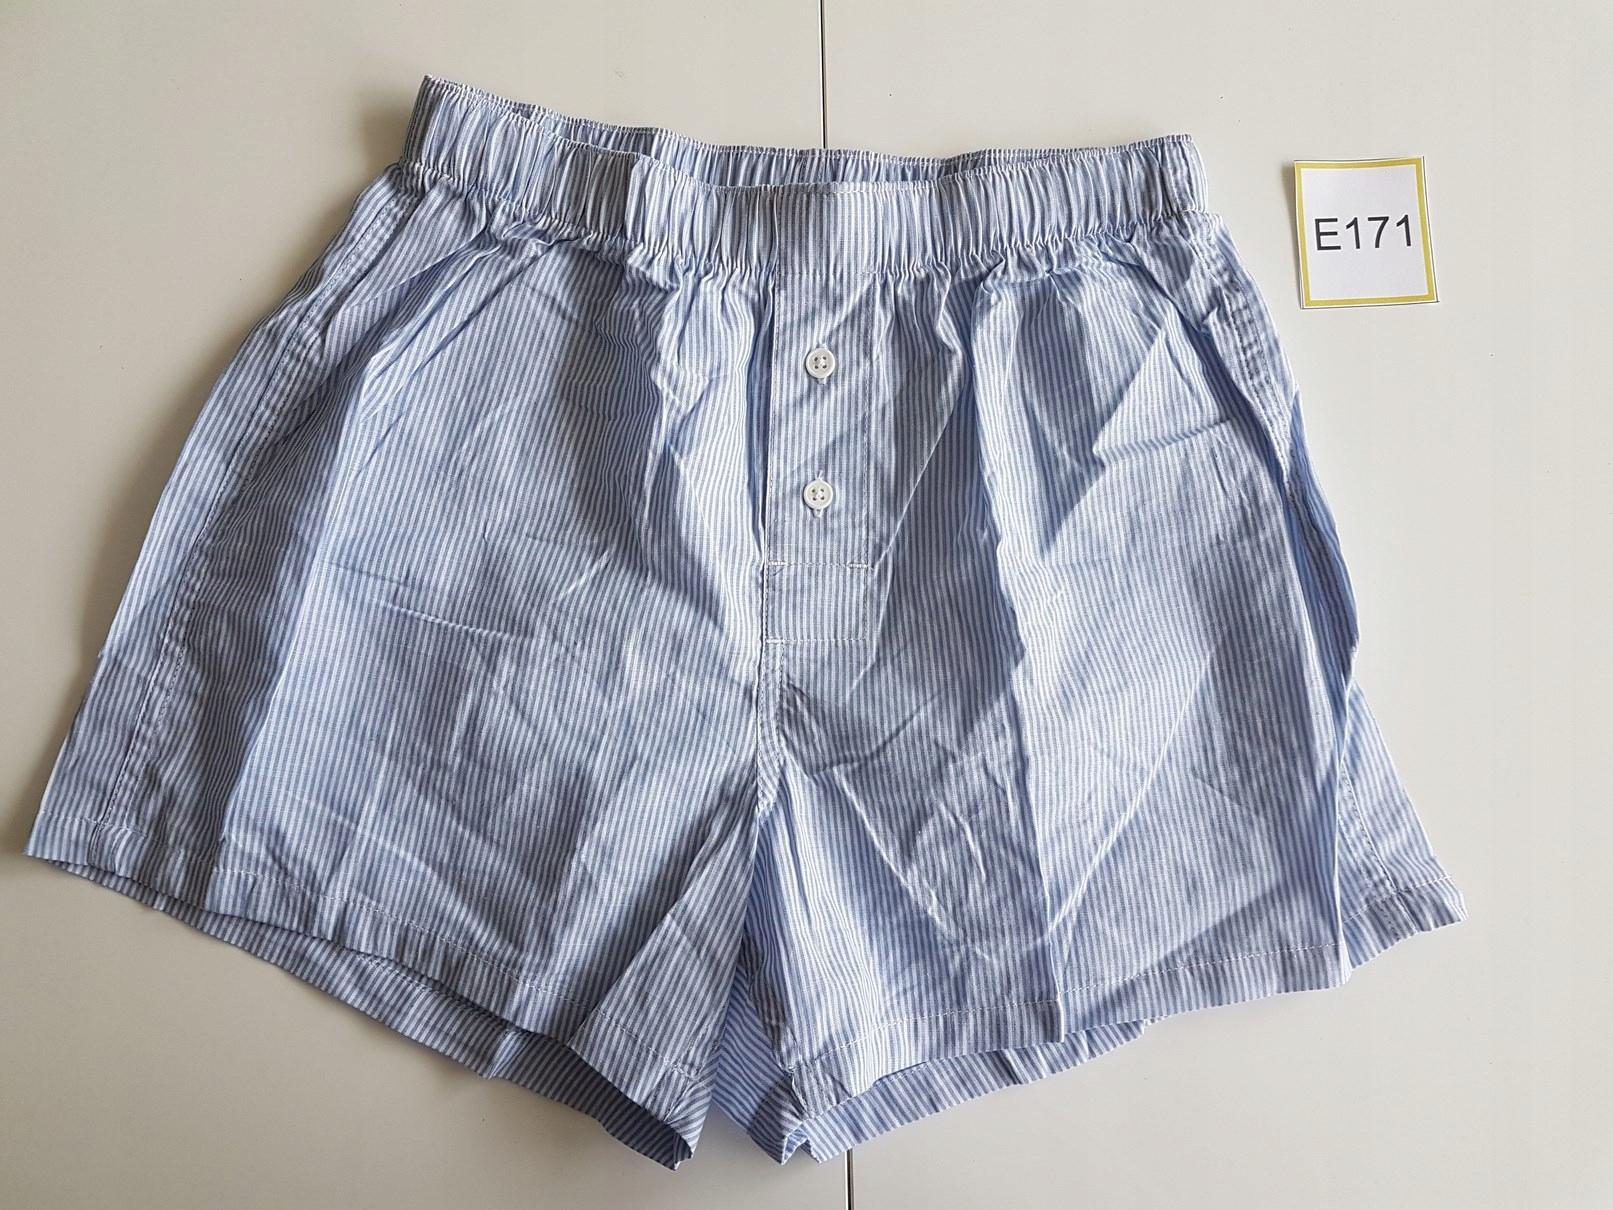 BOKSERKI majtki H&M XS/S SZORTY PIŻAMA E171